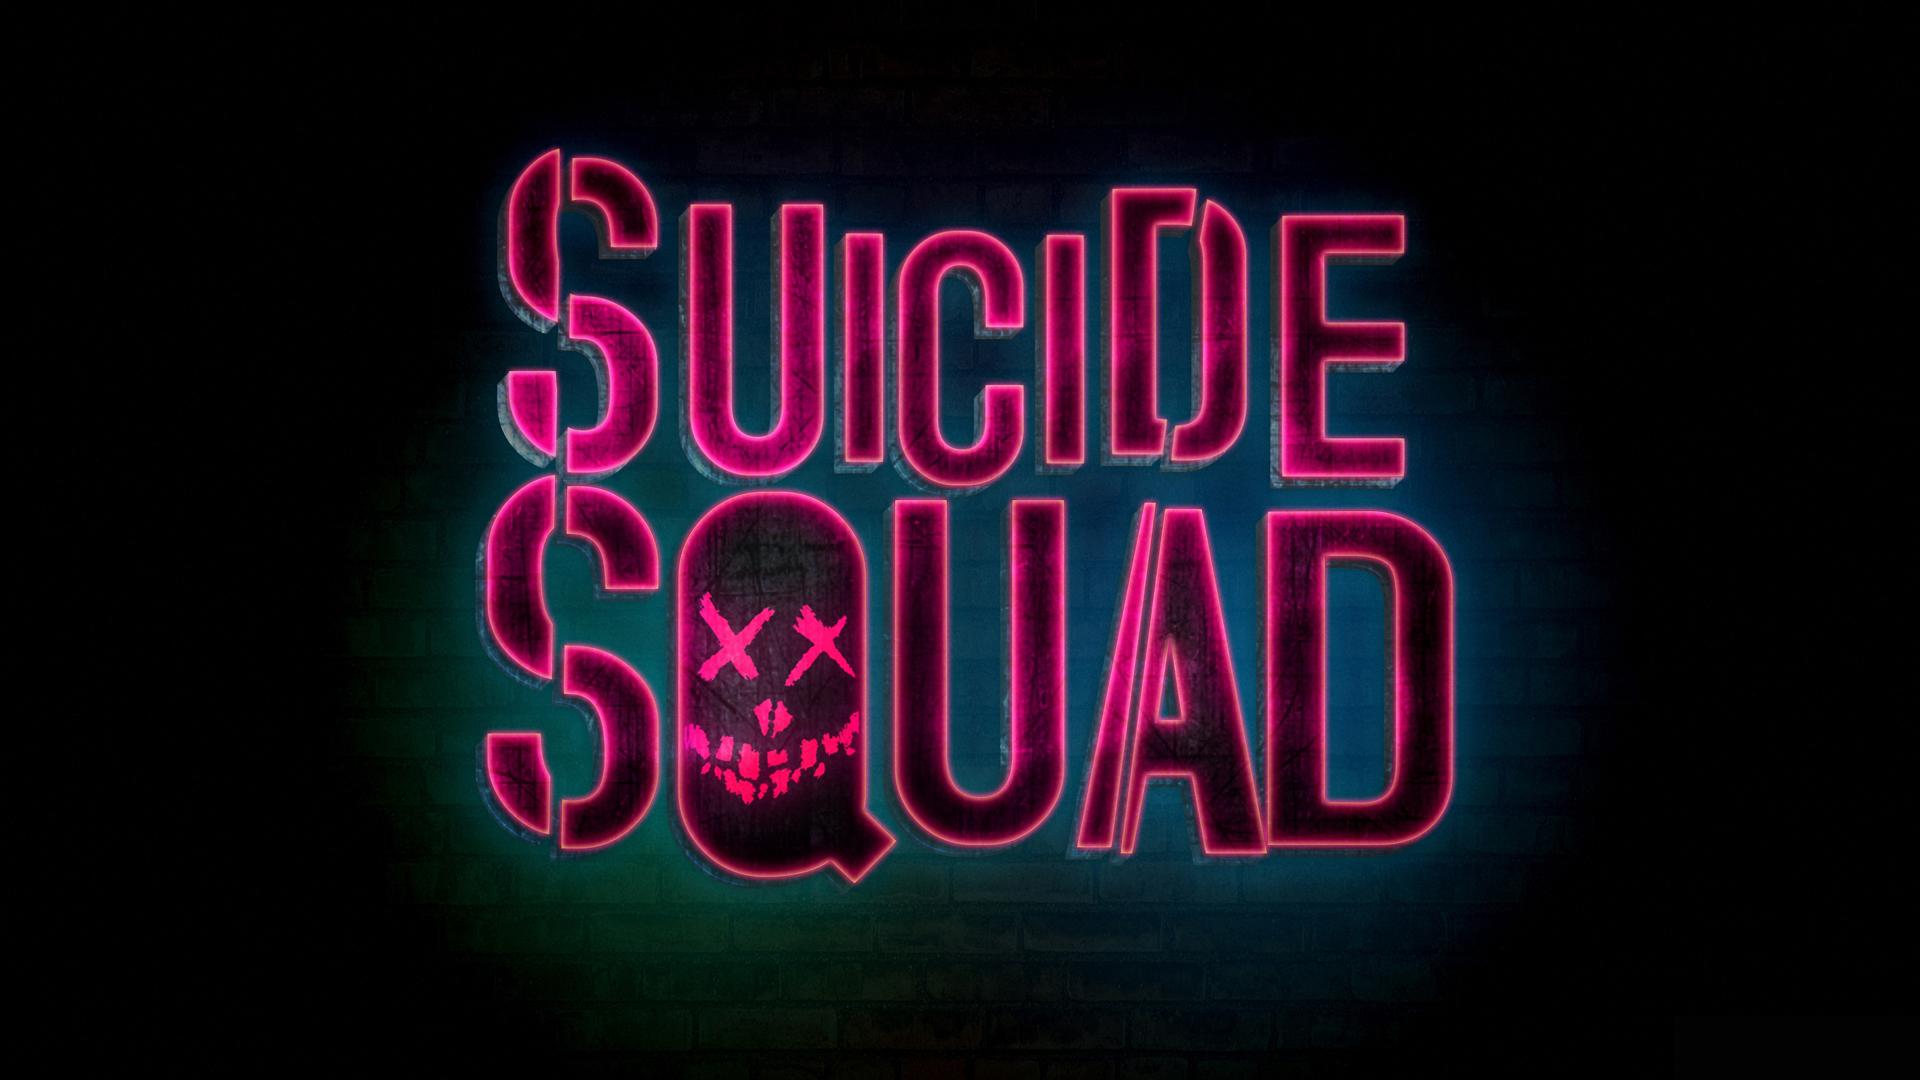 Transformers Logo Wallpaper Hd Fondos Escuadr 243 N Suicida Wallpapers Suicide Squad Pelicula